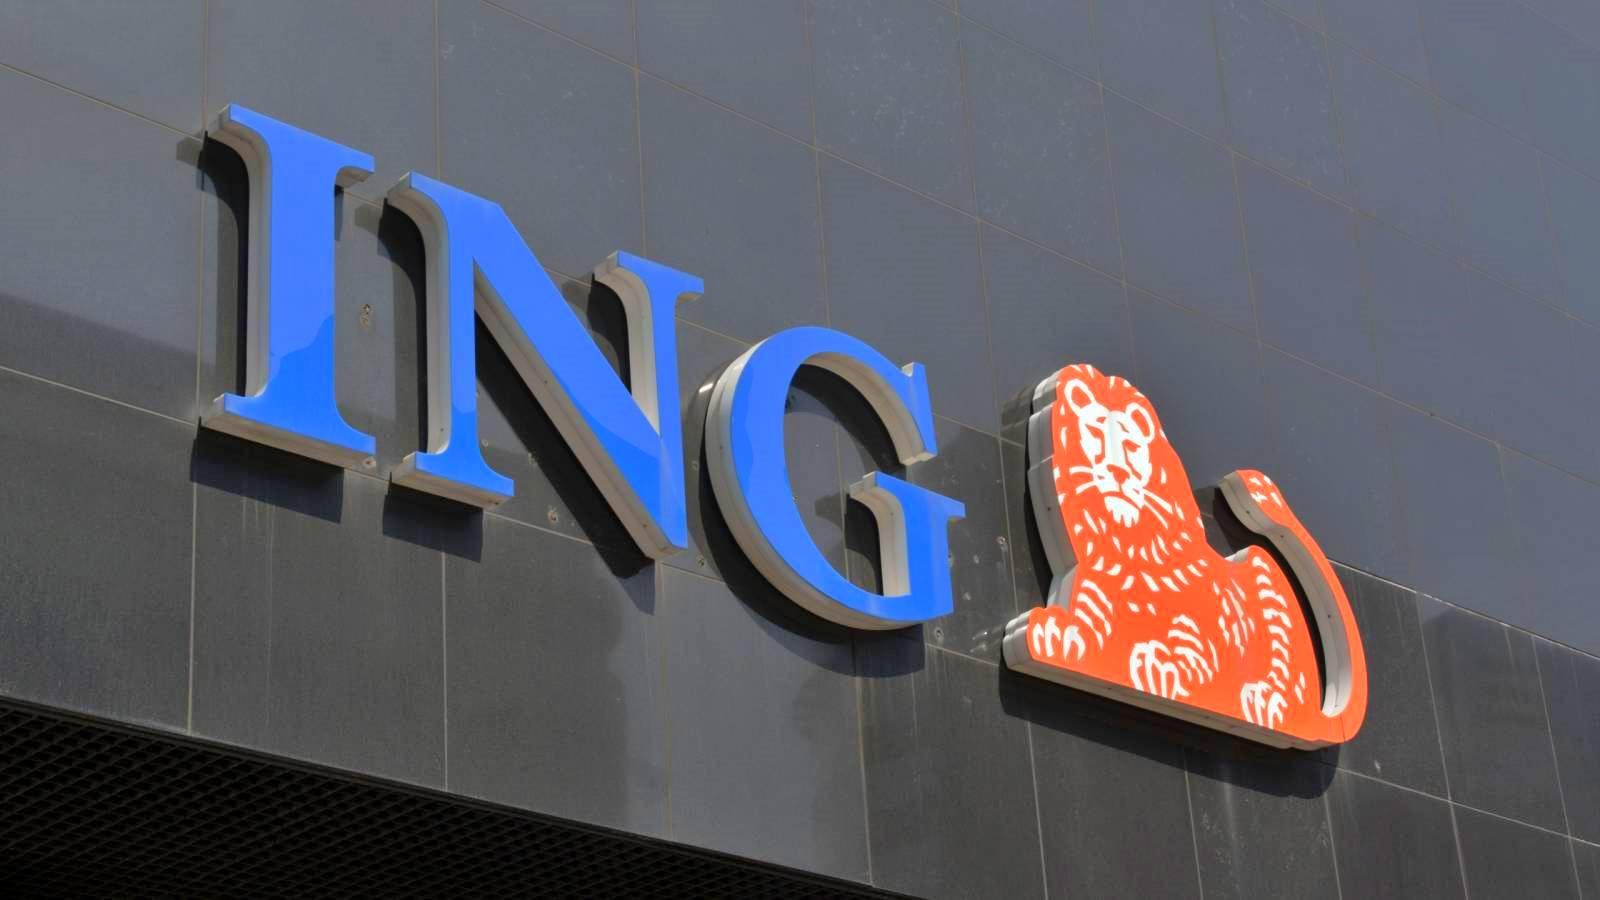 ING Bank: Informare Oficiala cu o AVERTIZARE pentru Clienti thumbnail